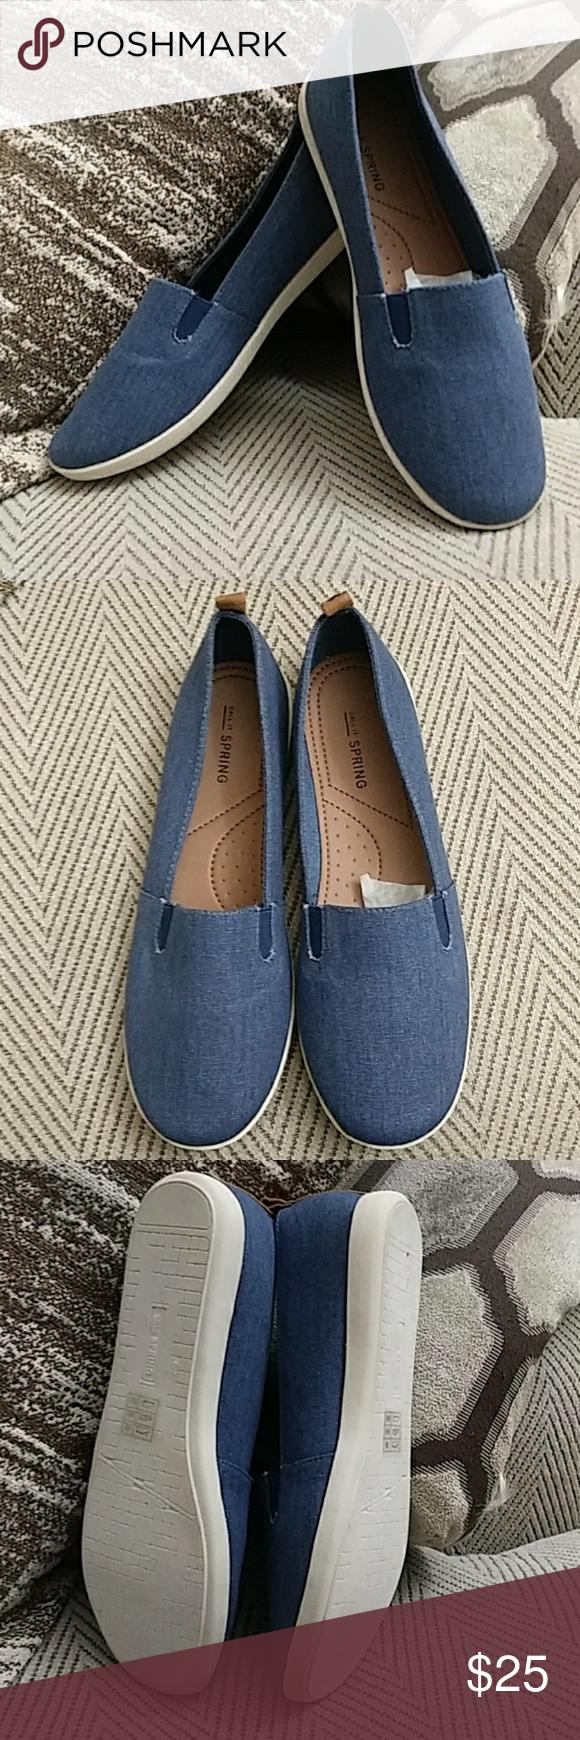 Size 8 / Slip Ons *NWT* *Still in Box* °Blie Jean